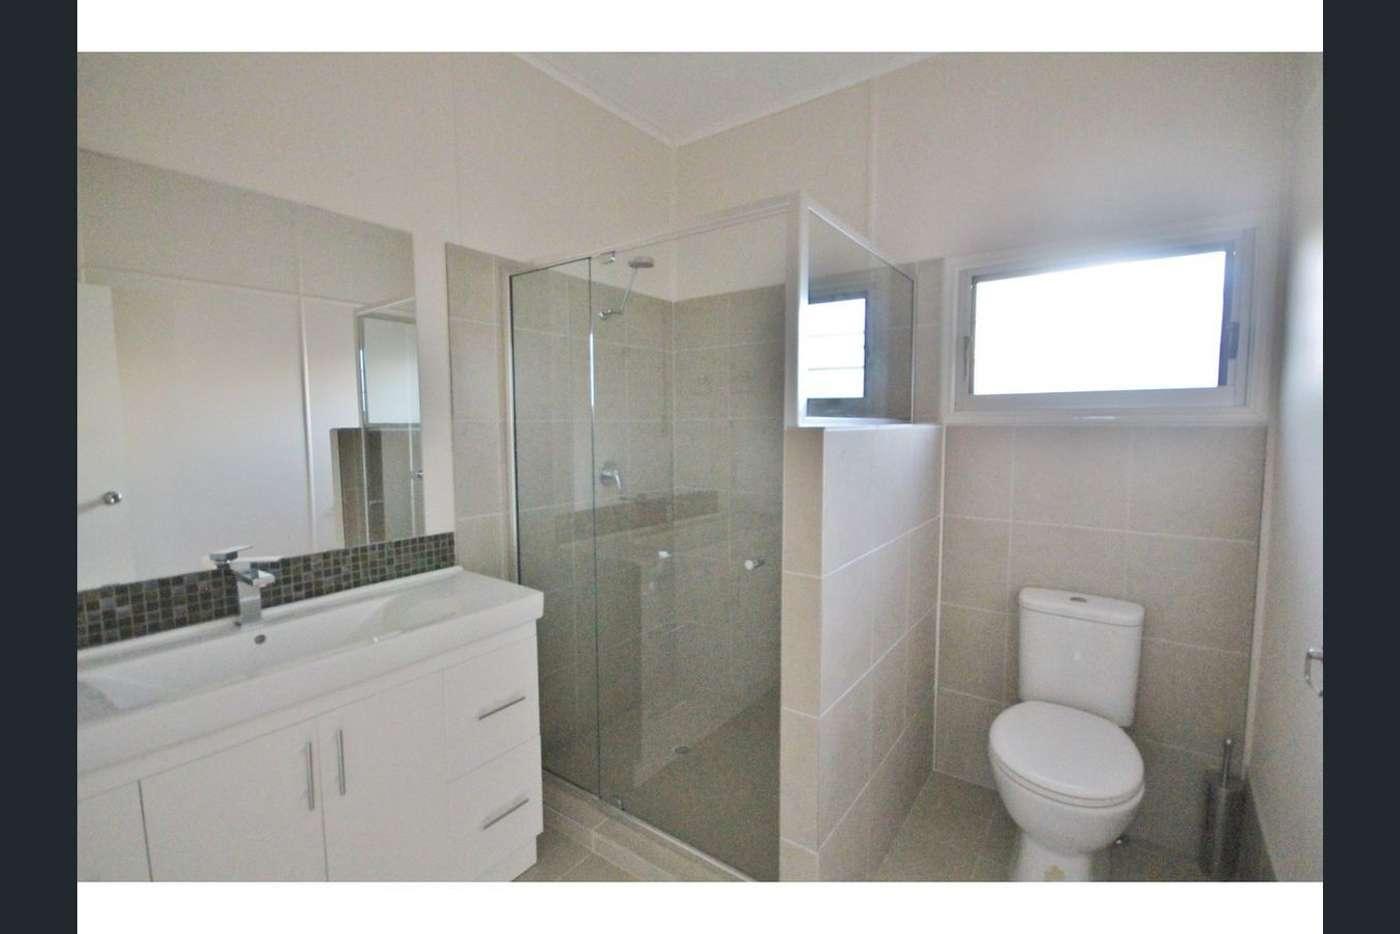 Sixth view of Homely house listing, 95 Hertford Street, Upper Mount Gravatt QLD 4122